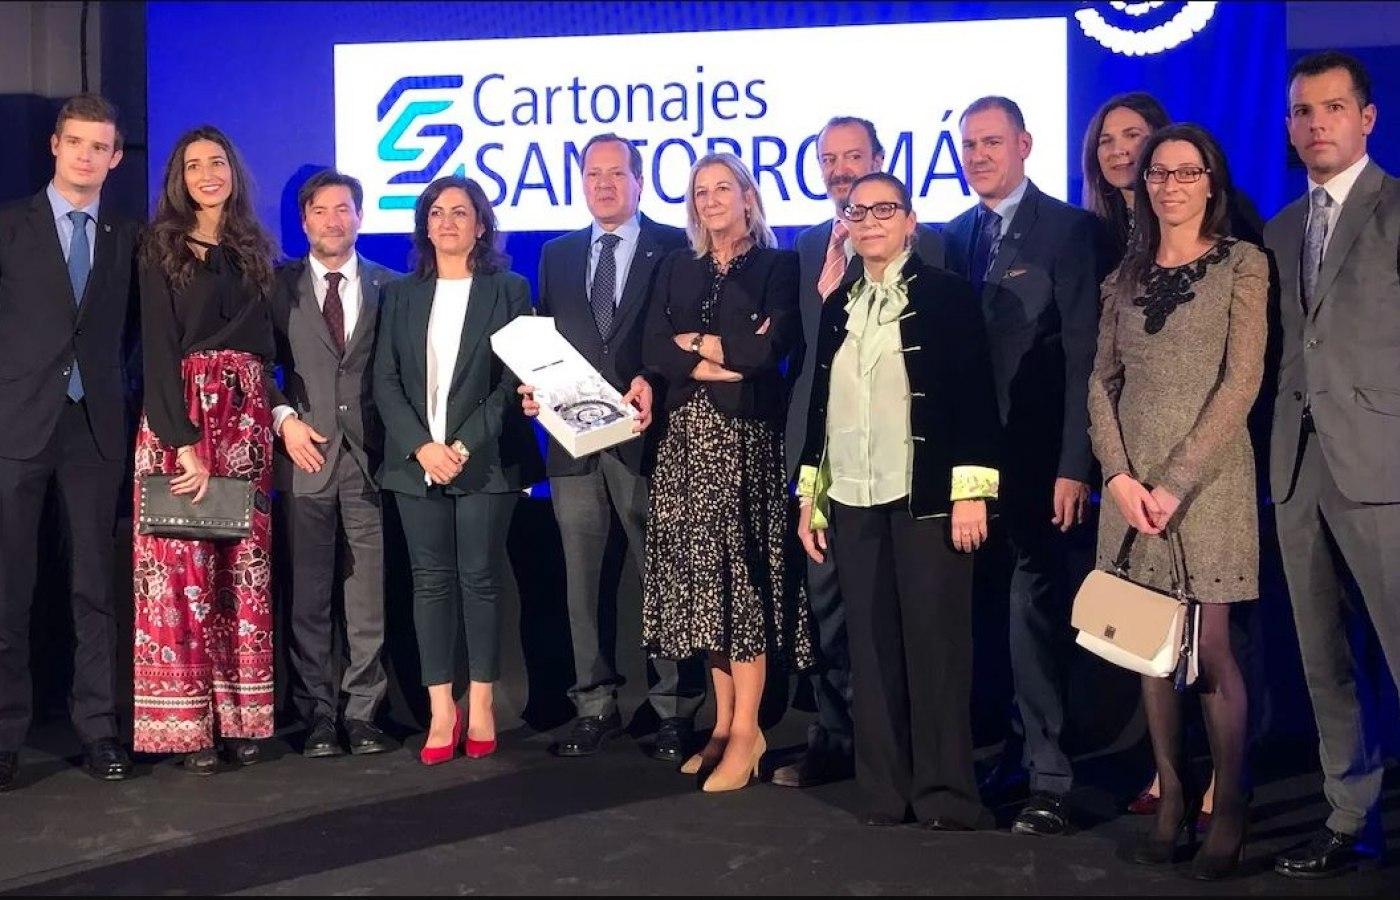 CARTONAJES SANTORROMÁN Empresa familiar riojana 2019